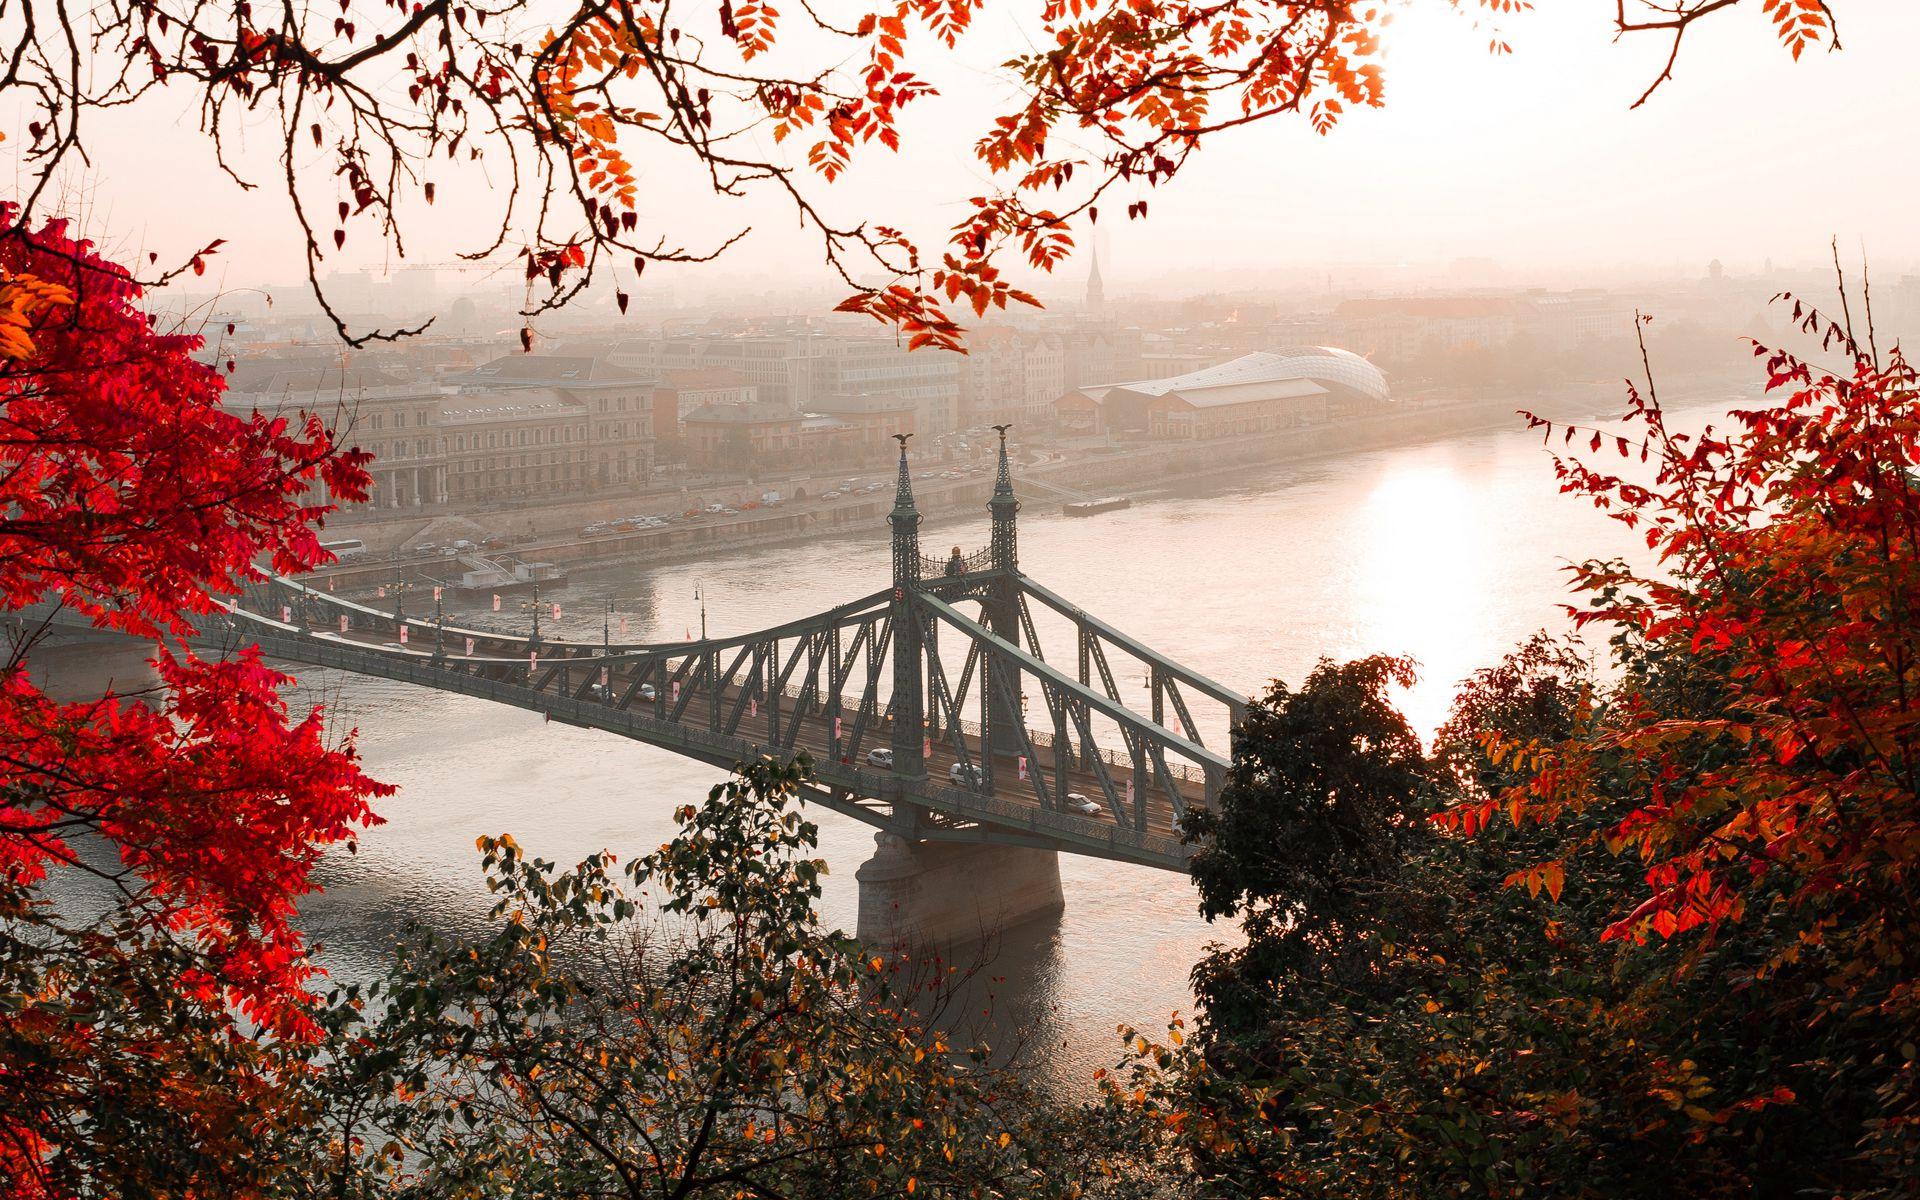 1920x1200 Wallpaper bridge, autumn, city, citadella, budapest, hungary